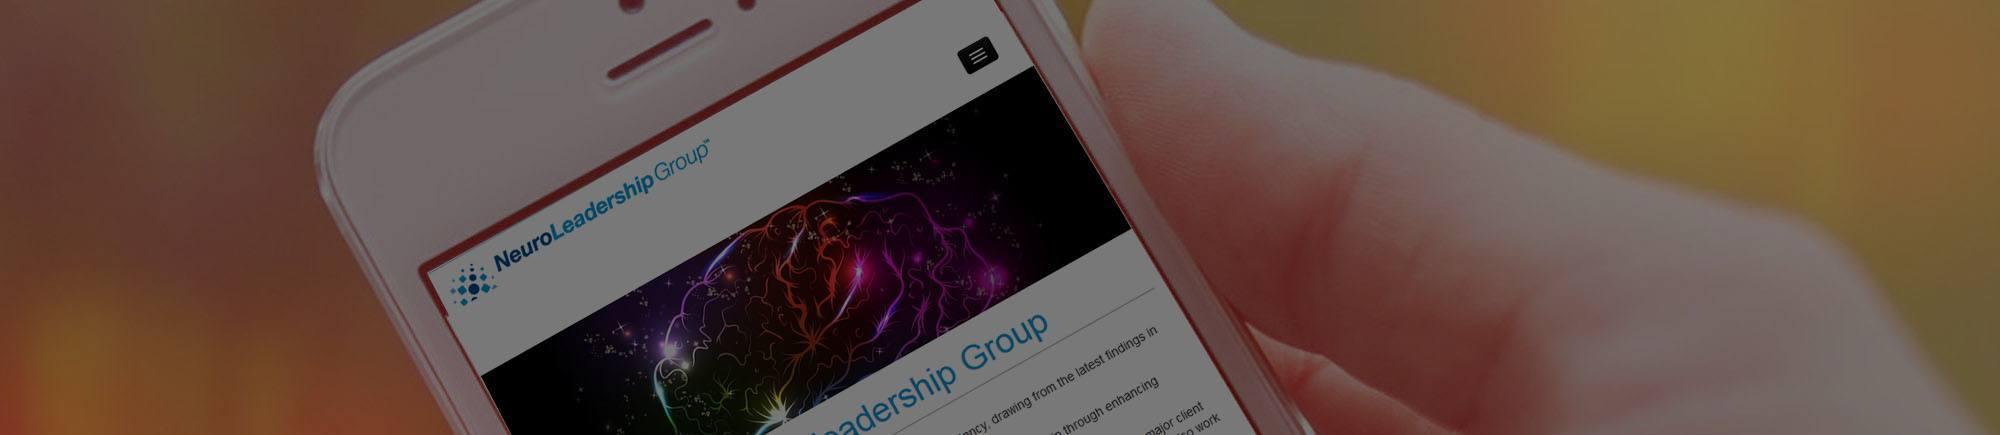 Responsive Websites Dubai